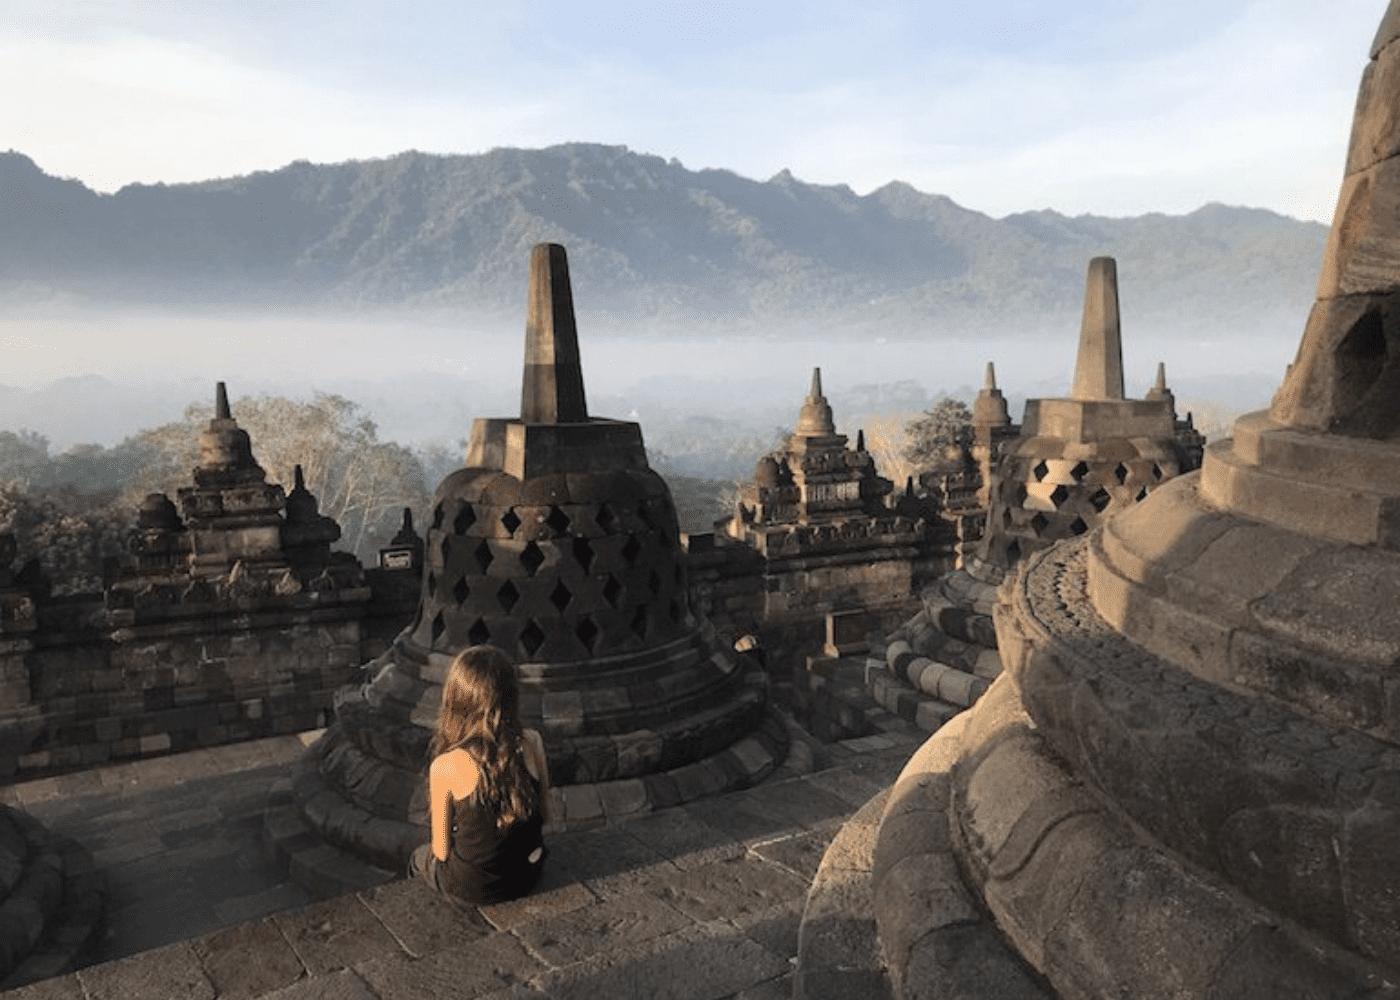 Vesak Day | Borobudur temple